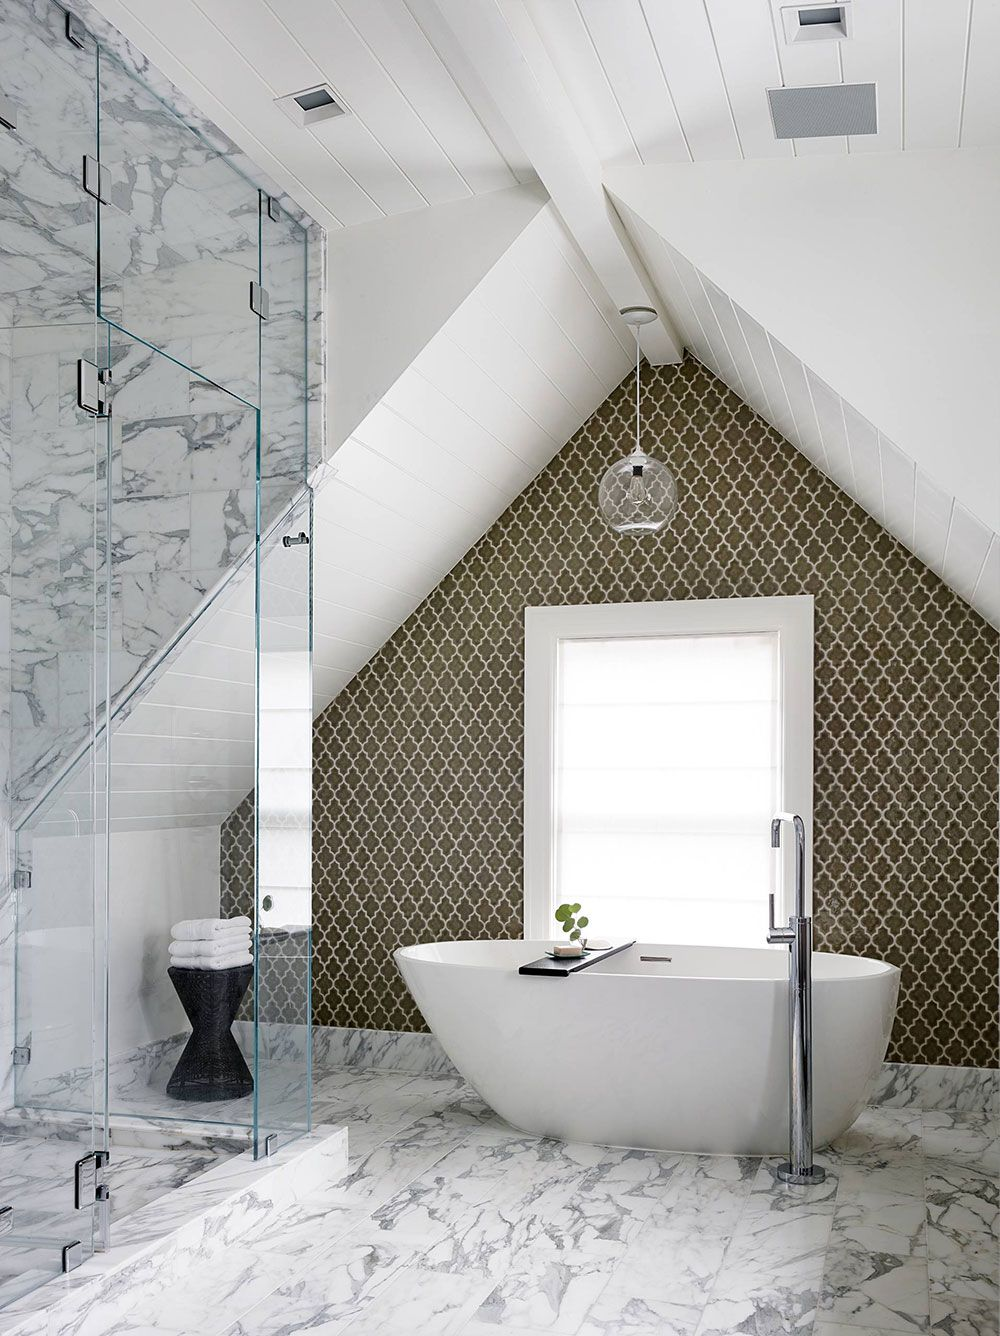 attic master bedroom breathtaking attic master bedroom ideas attic master bedroom - Modern Master Suite Bathroom